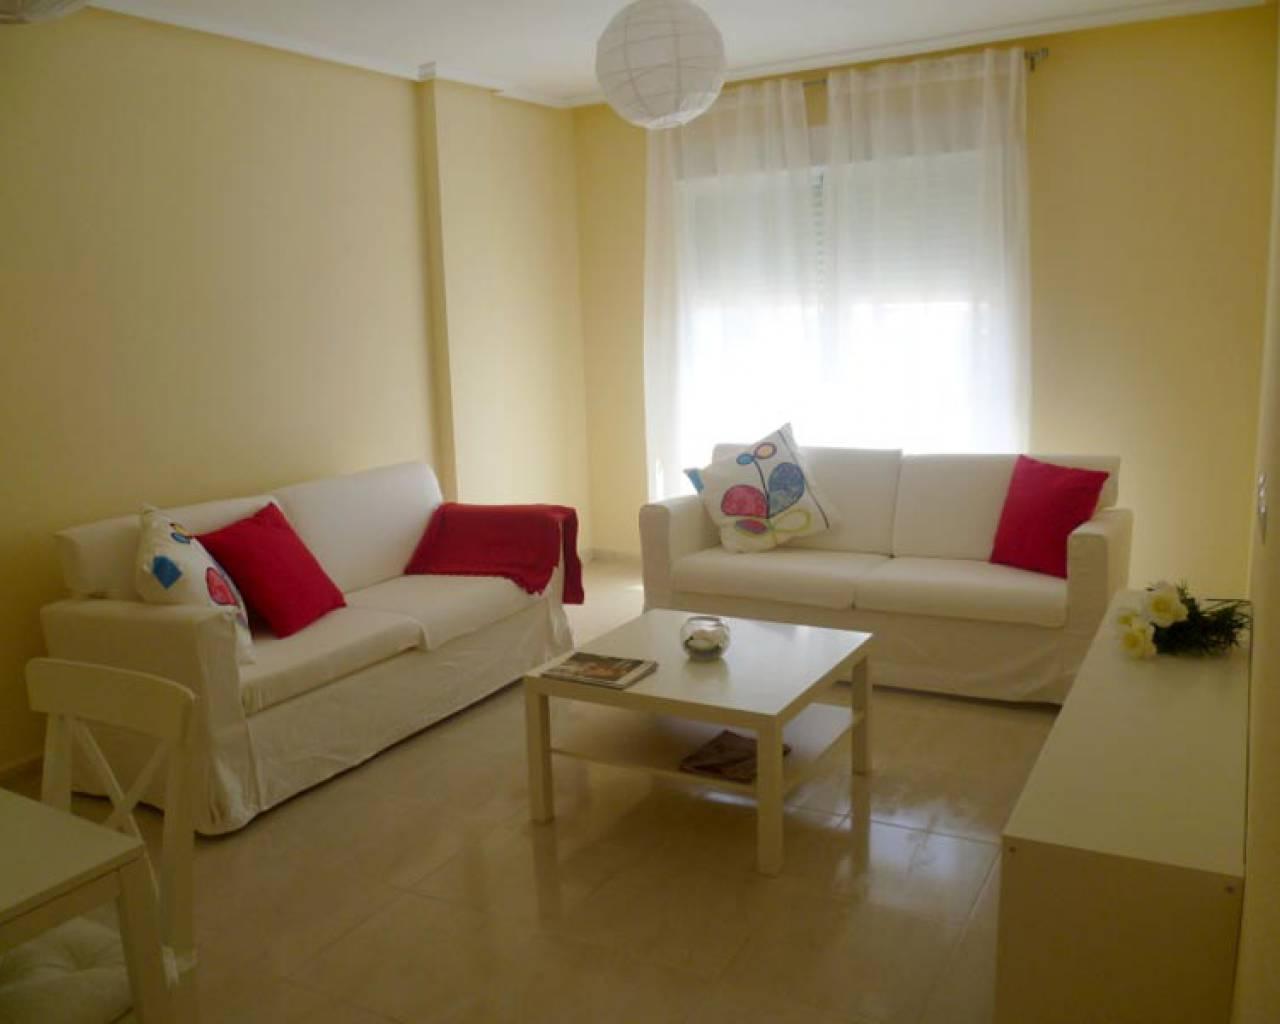 nieuwbouw-appartement-los-montesinos_1198_xl